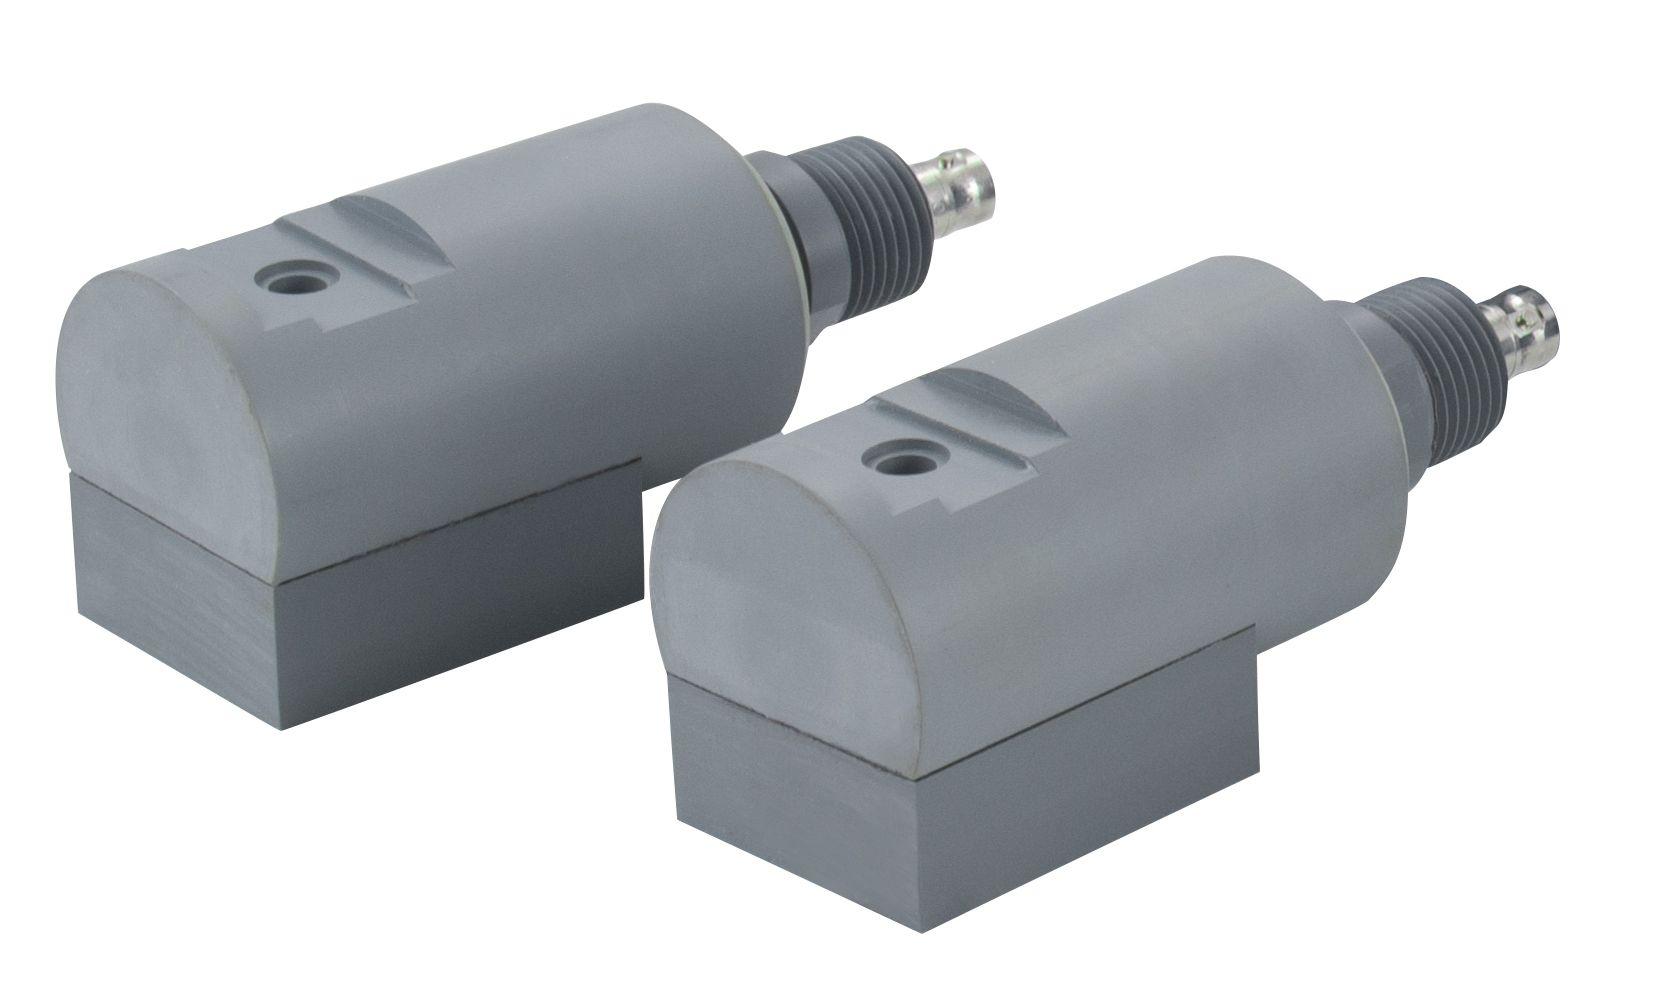 DT9 Transducer